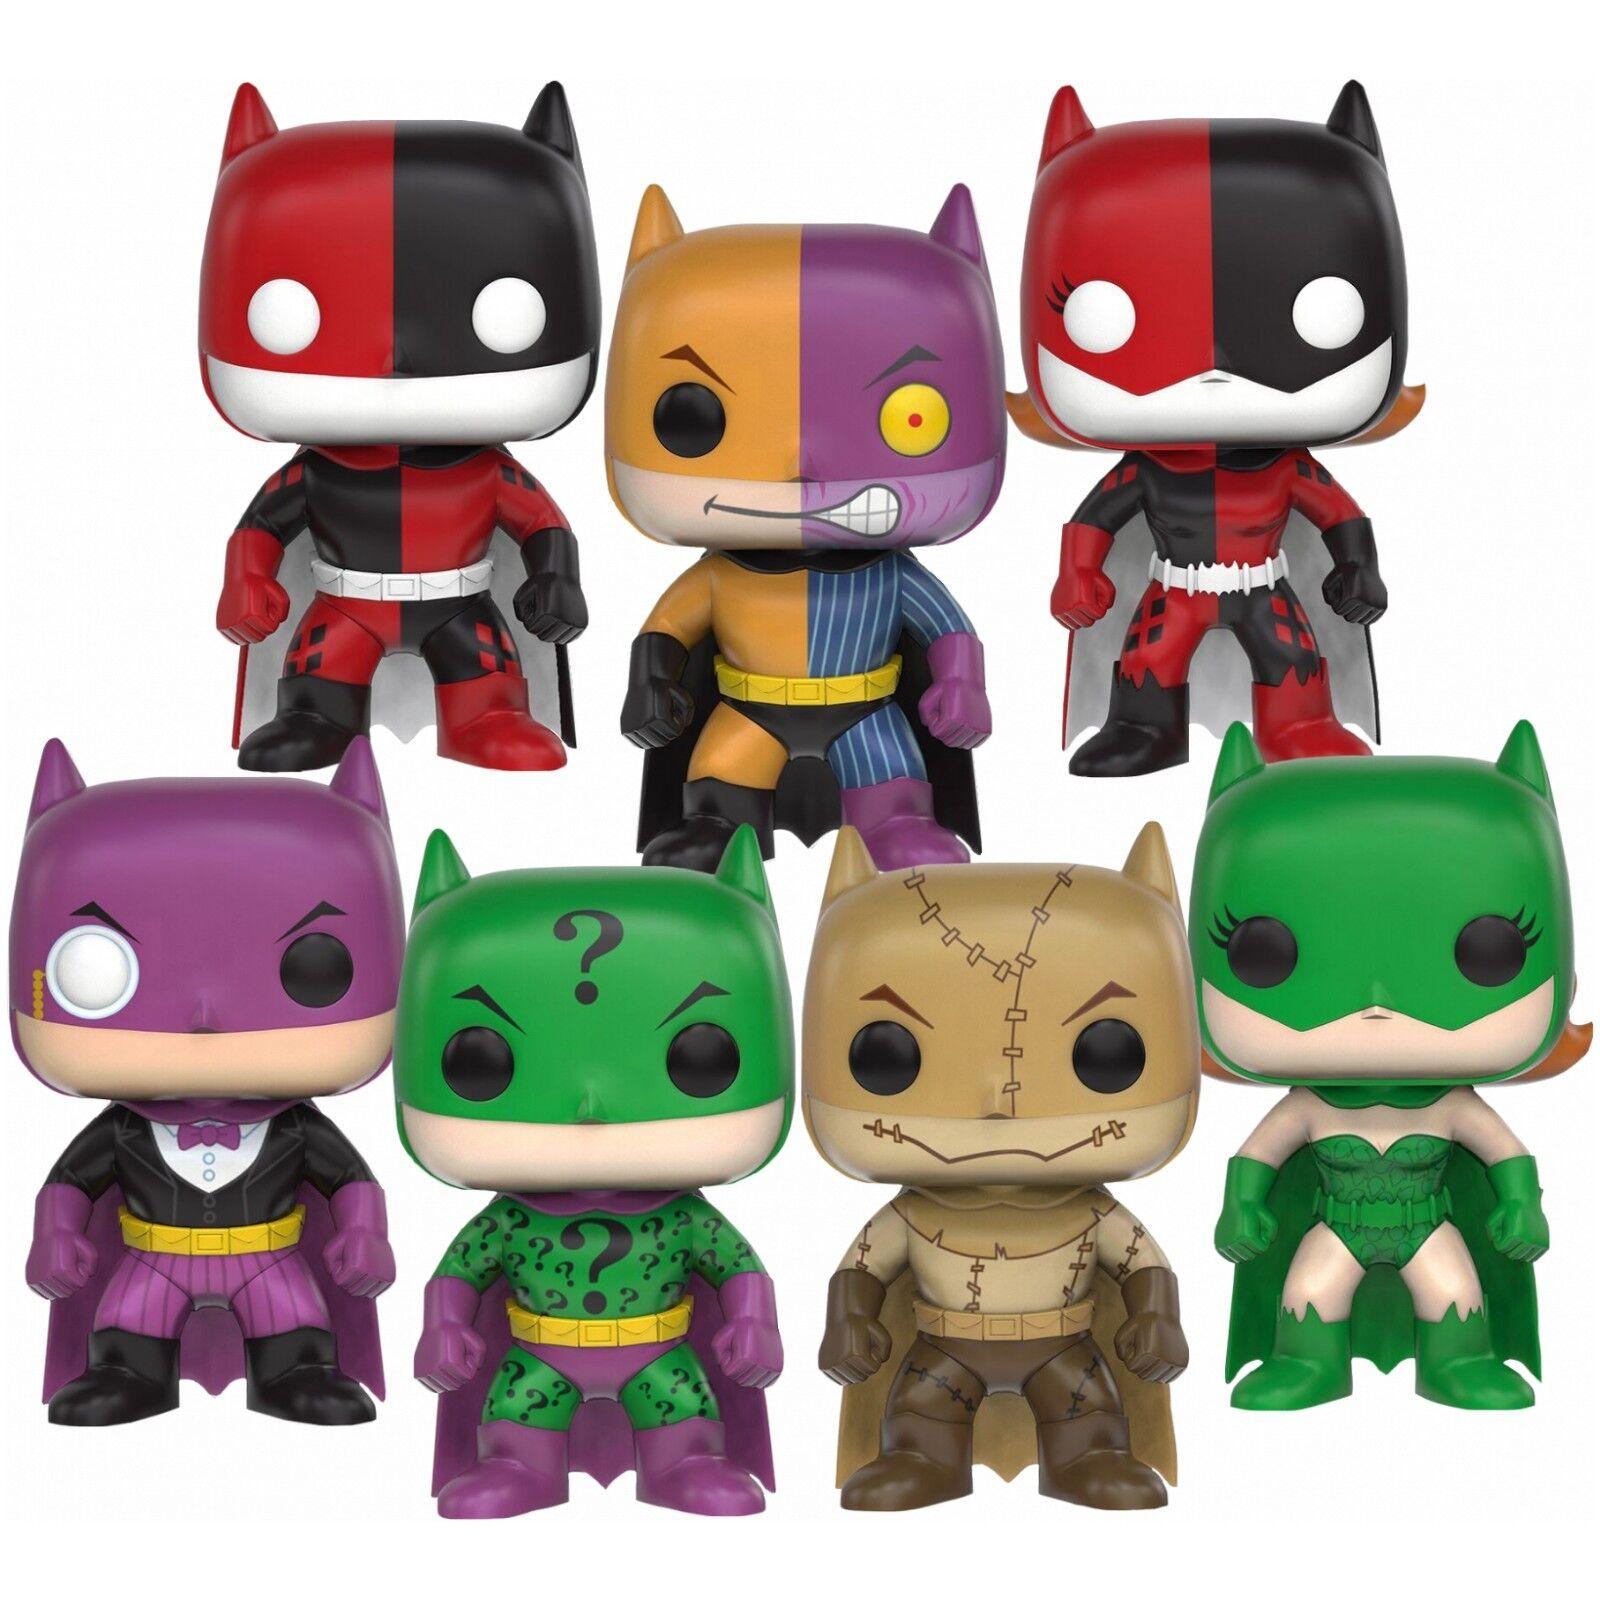 Batman - kassieren, wenn sie impopsters pop vinyl - paket (7)